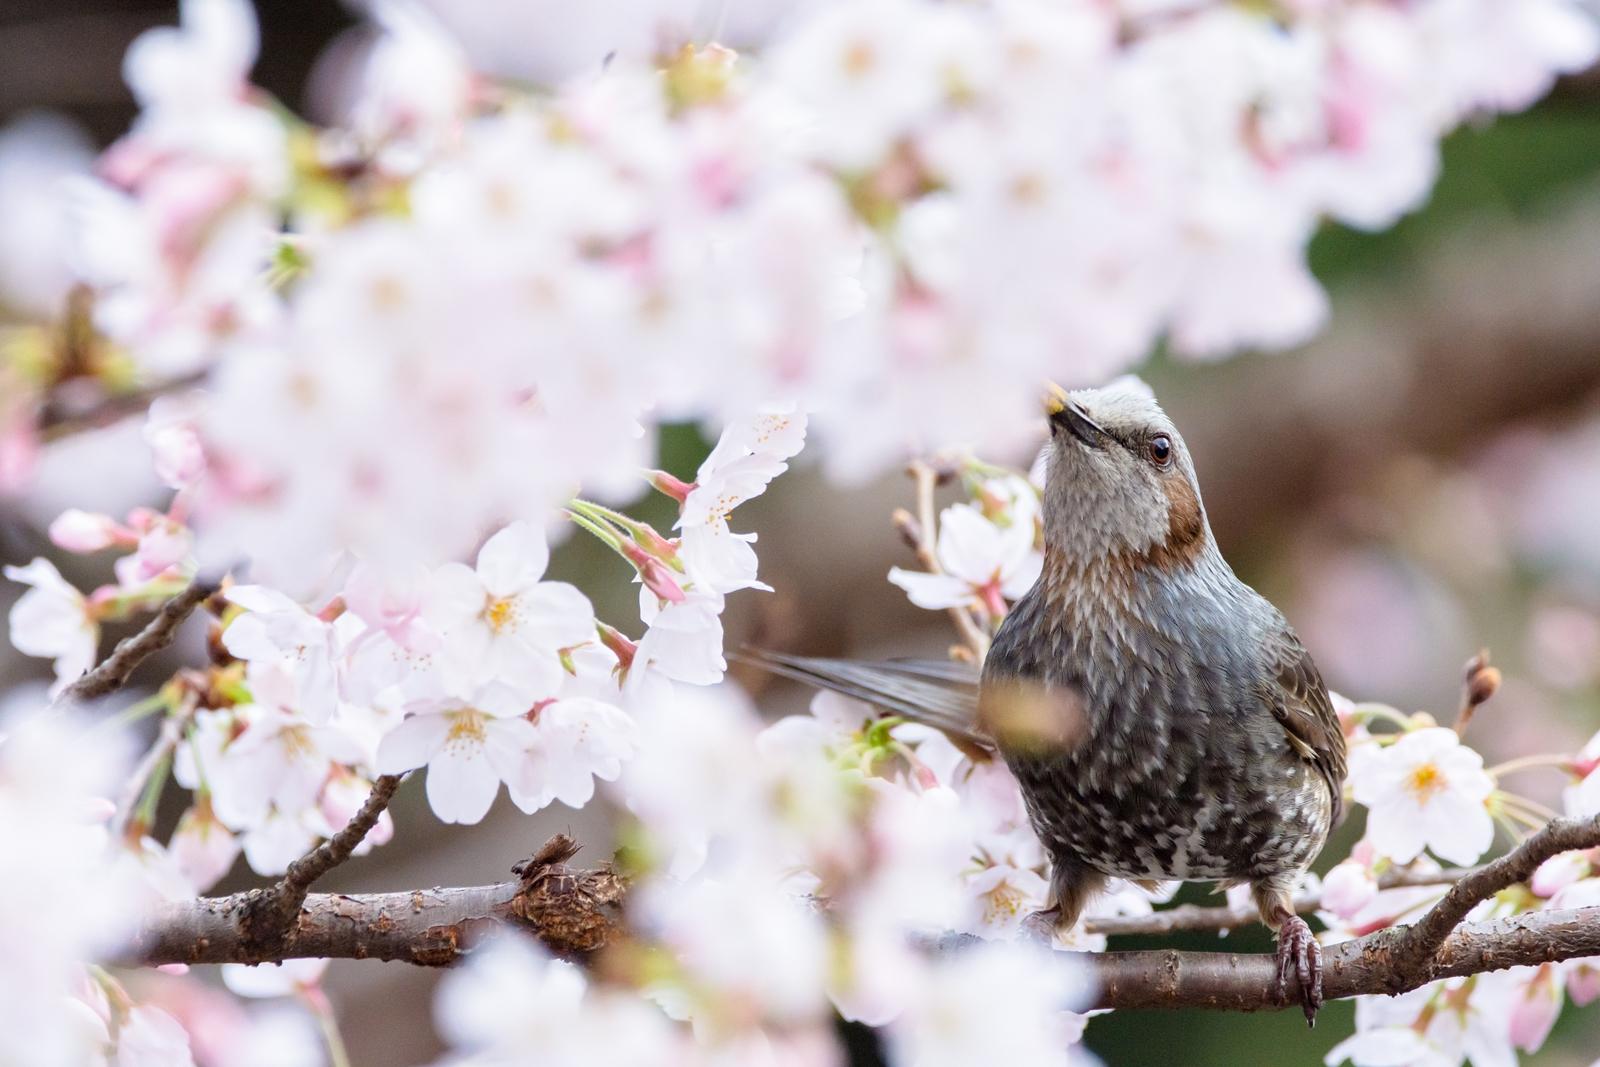 Photo: 「嬉しさ」 / Delight.  君が嬉しいと 僕も嬉しくて 君の楽しそうな表情が 僕の表情に笑顔をくれる  Brown-eared Bulbul. (ヒヨドリ)  Nikon D7200 SIGMA 150-600mm F5-6.3 DG OS HSM Contemporary  #birdphotography #birds #kawaii #小鳥 #nikon #sigma #小鳥グラファー  ( http://takafumiooshio.com/archives/1311 )